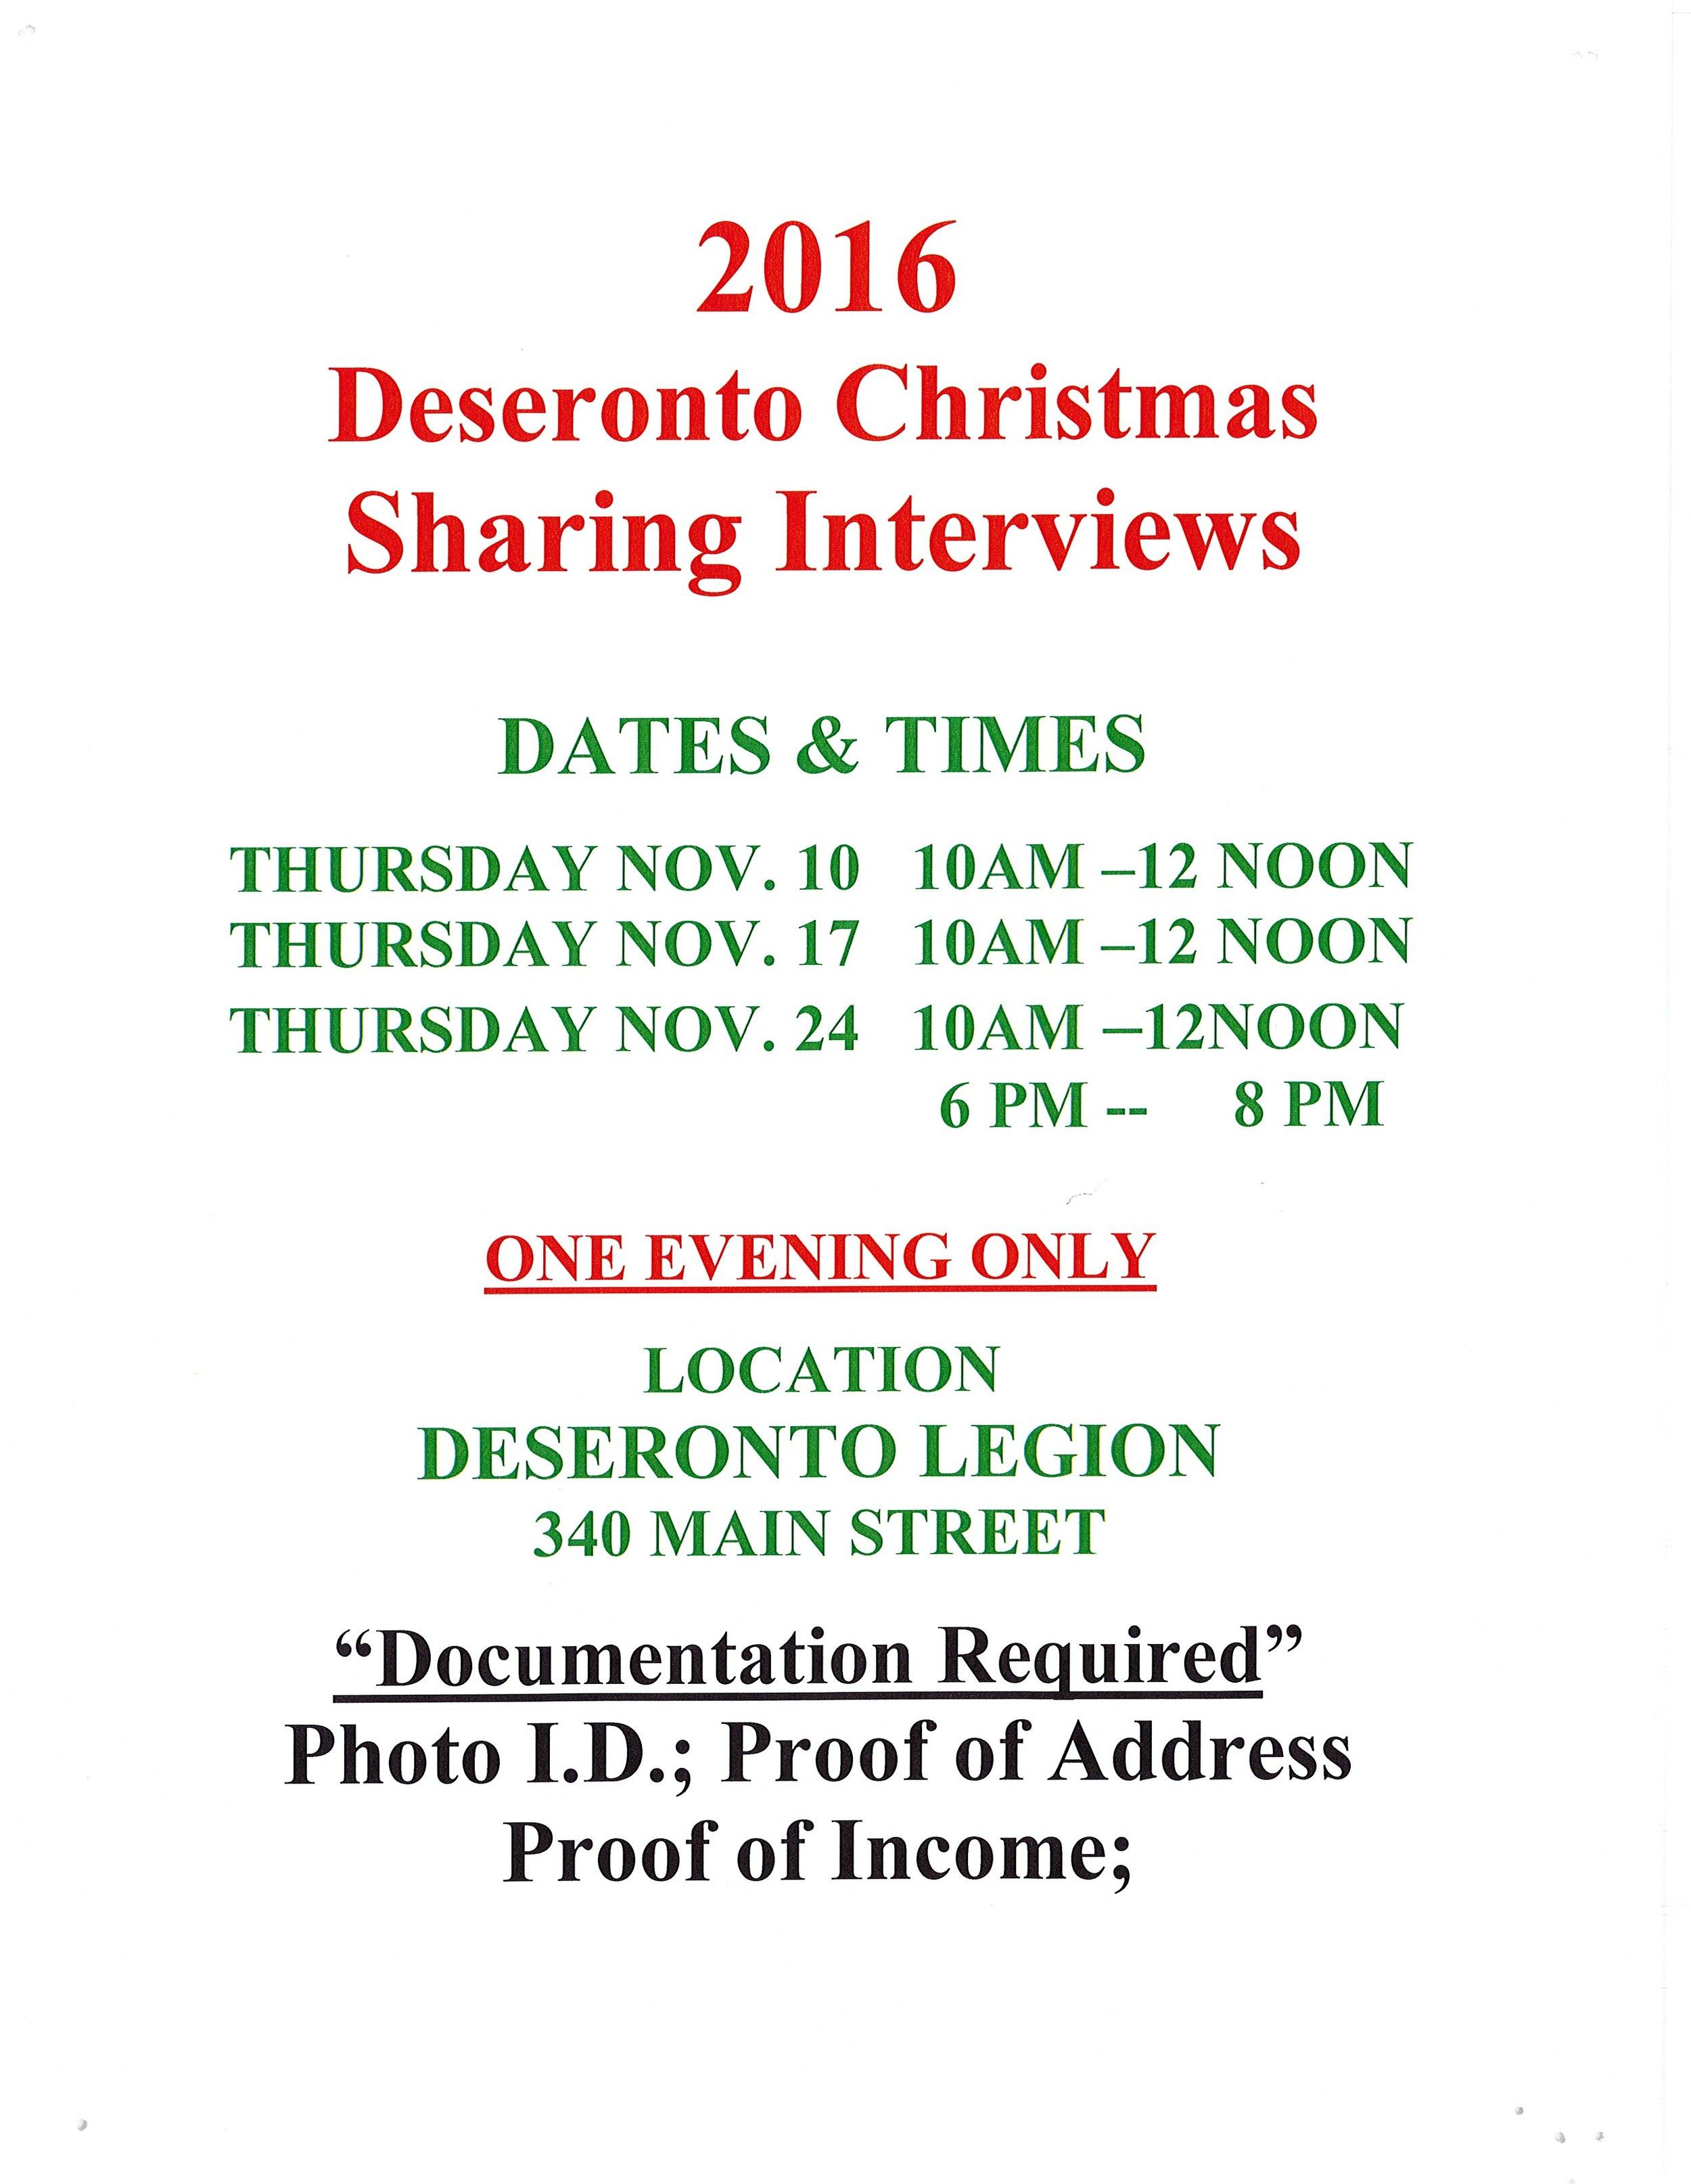 Christmas Sharing 2016